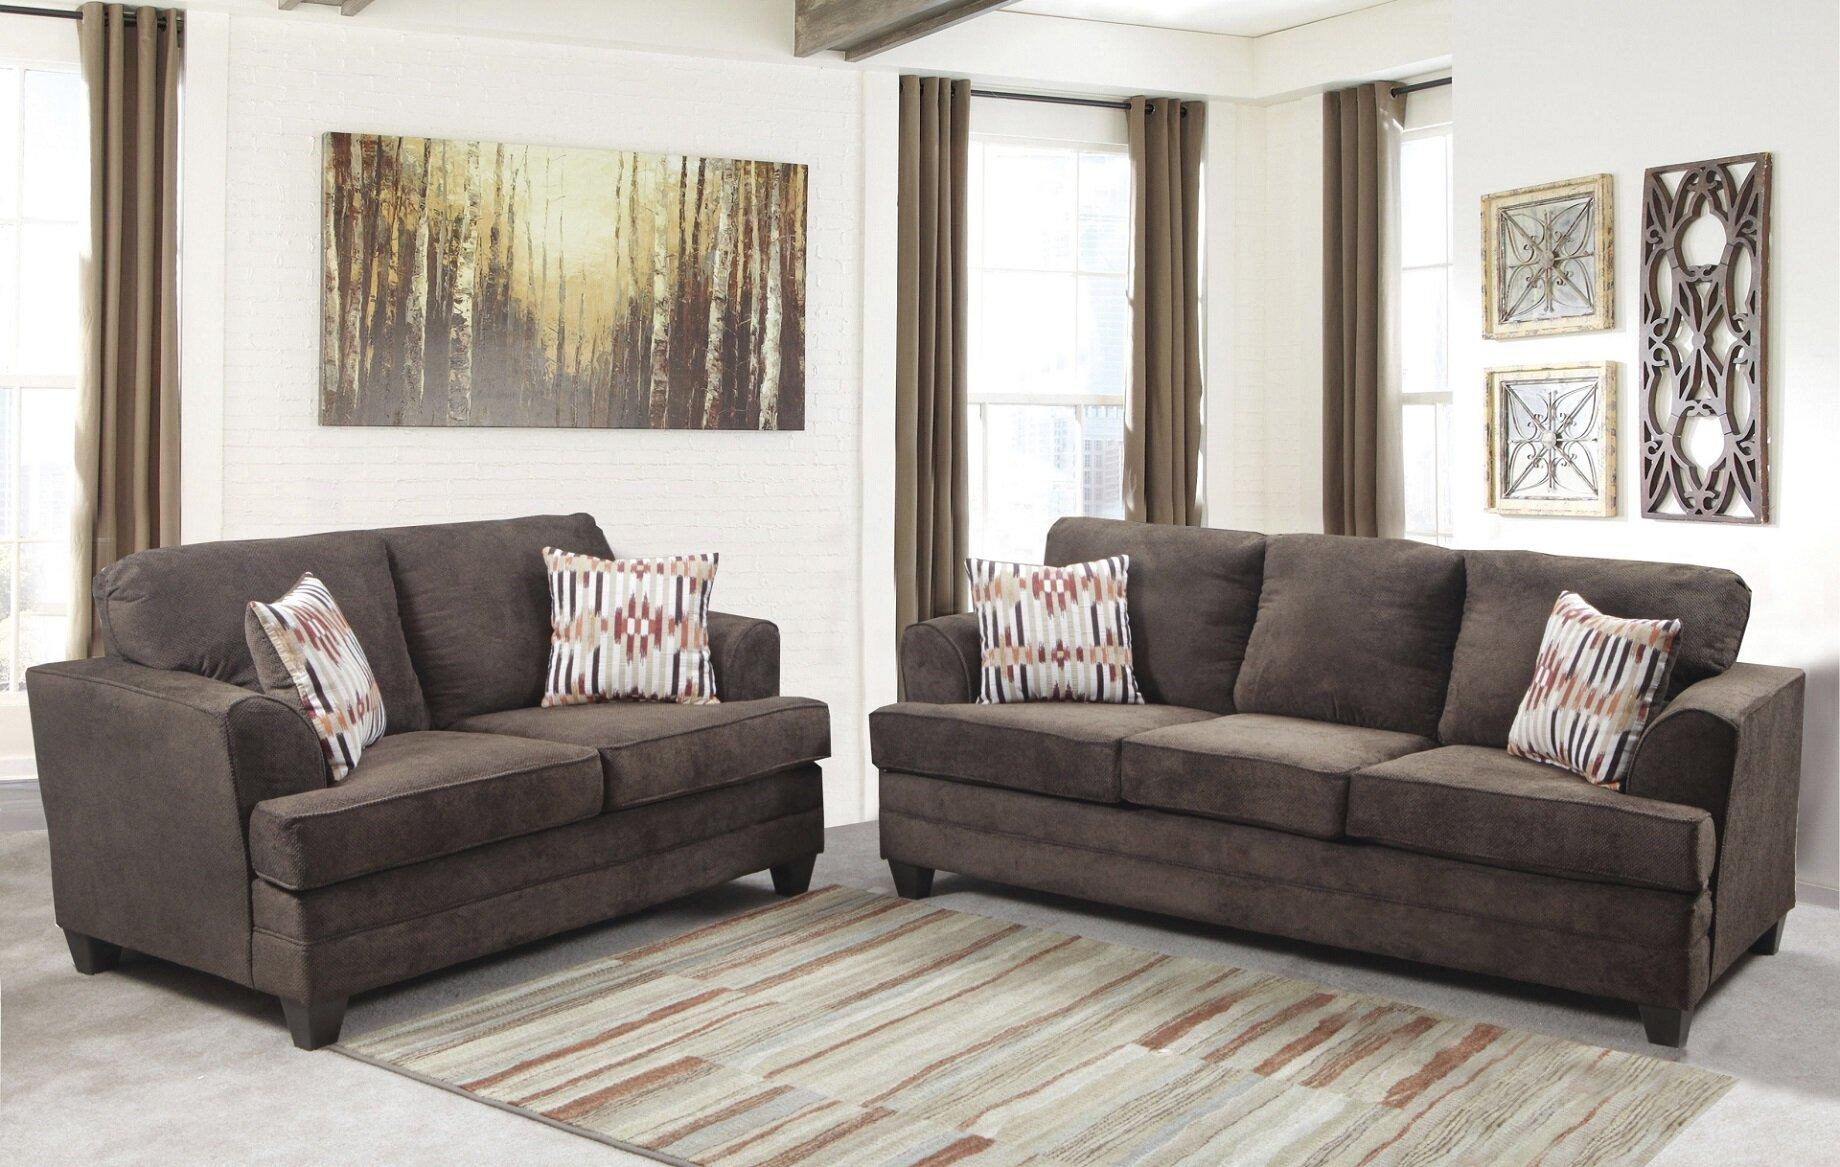 Winston porter napoleon 2 piece living room set wayfair